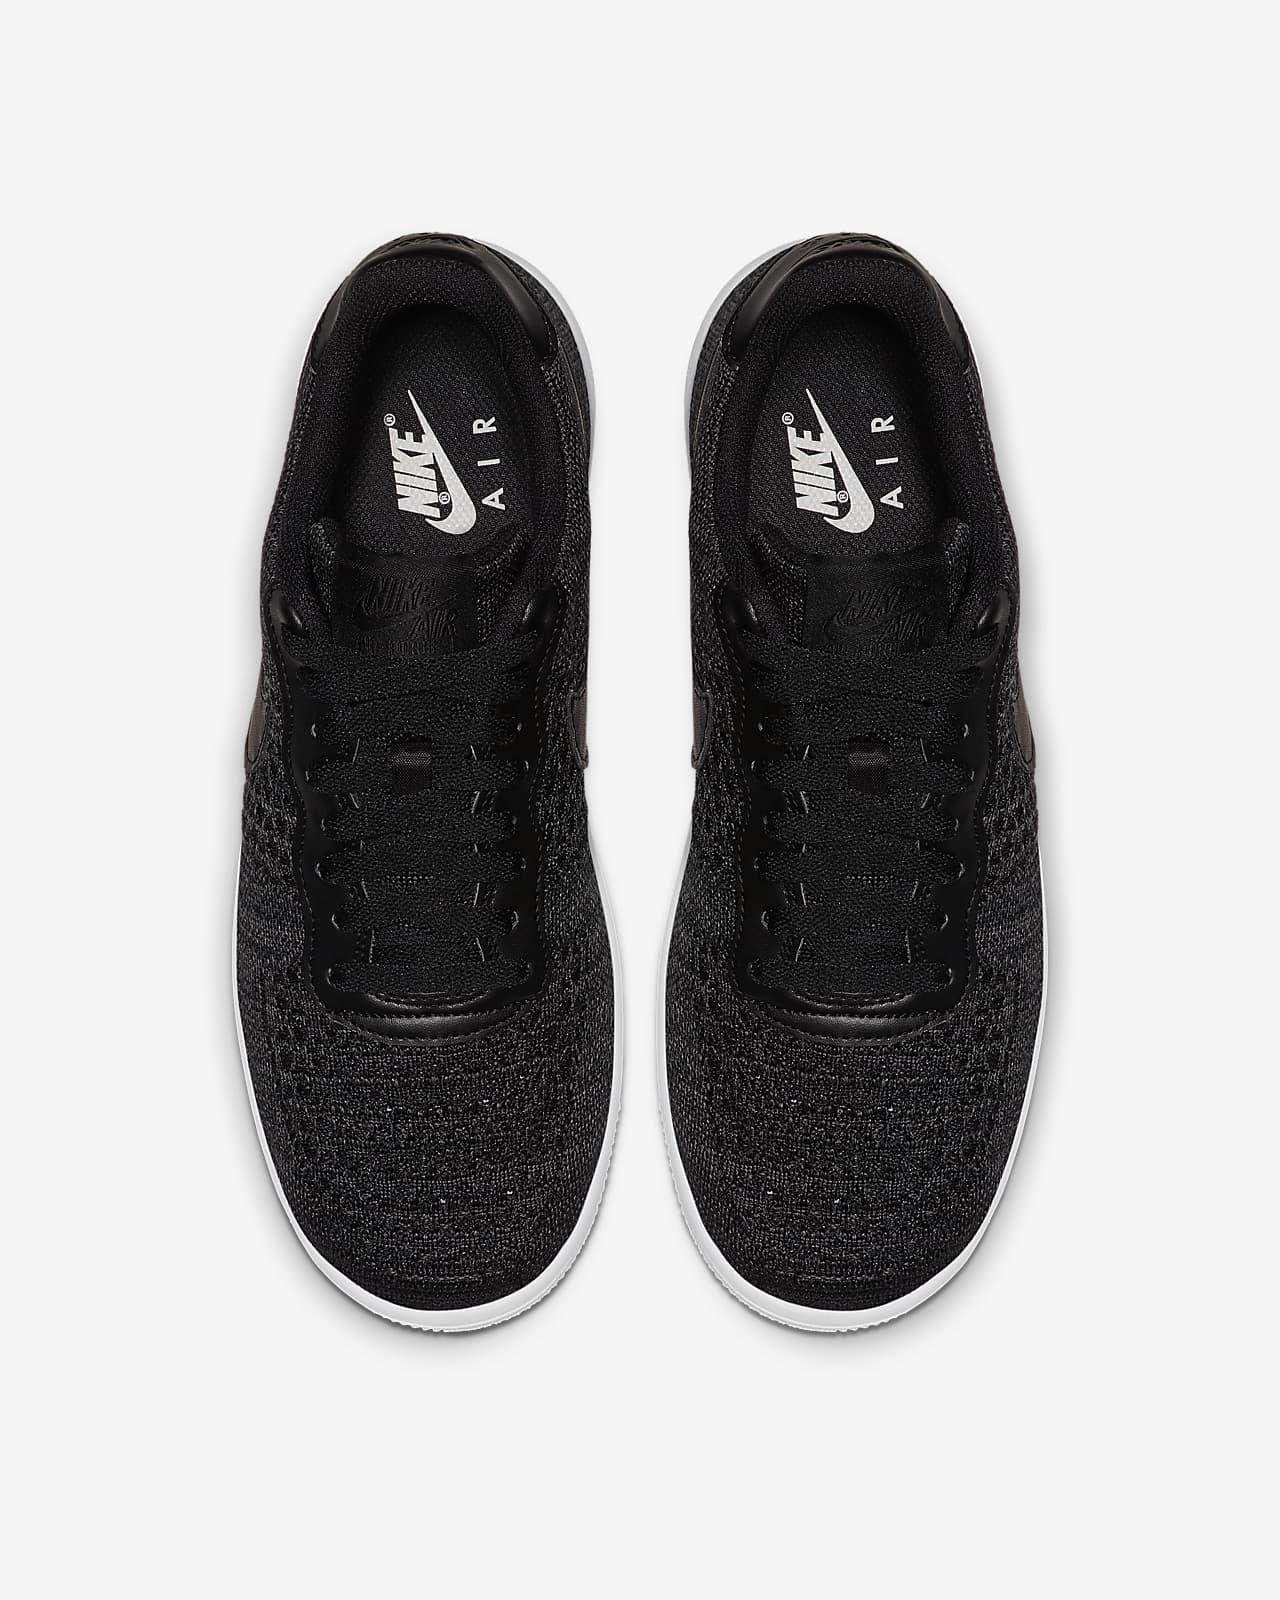 Nike Air Force 1 Flyknit 2.0 sko til herre